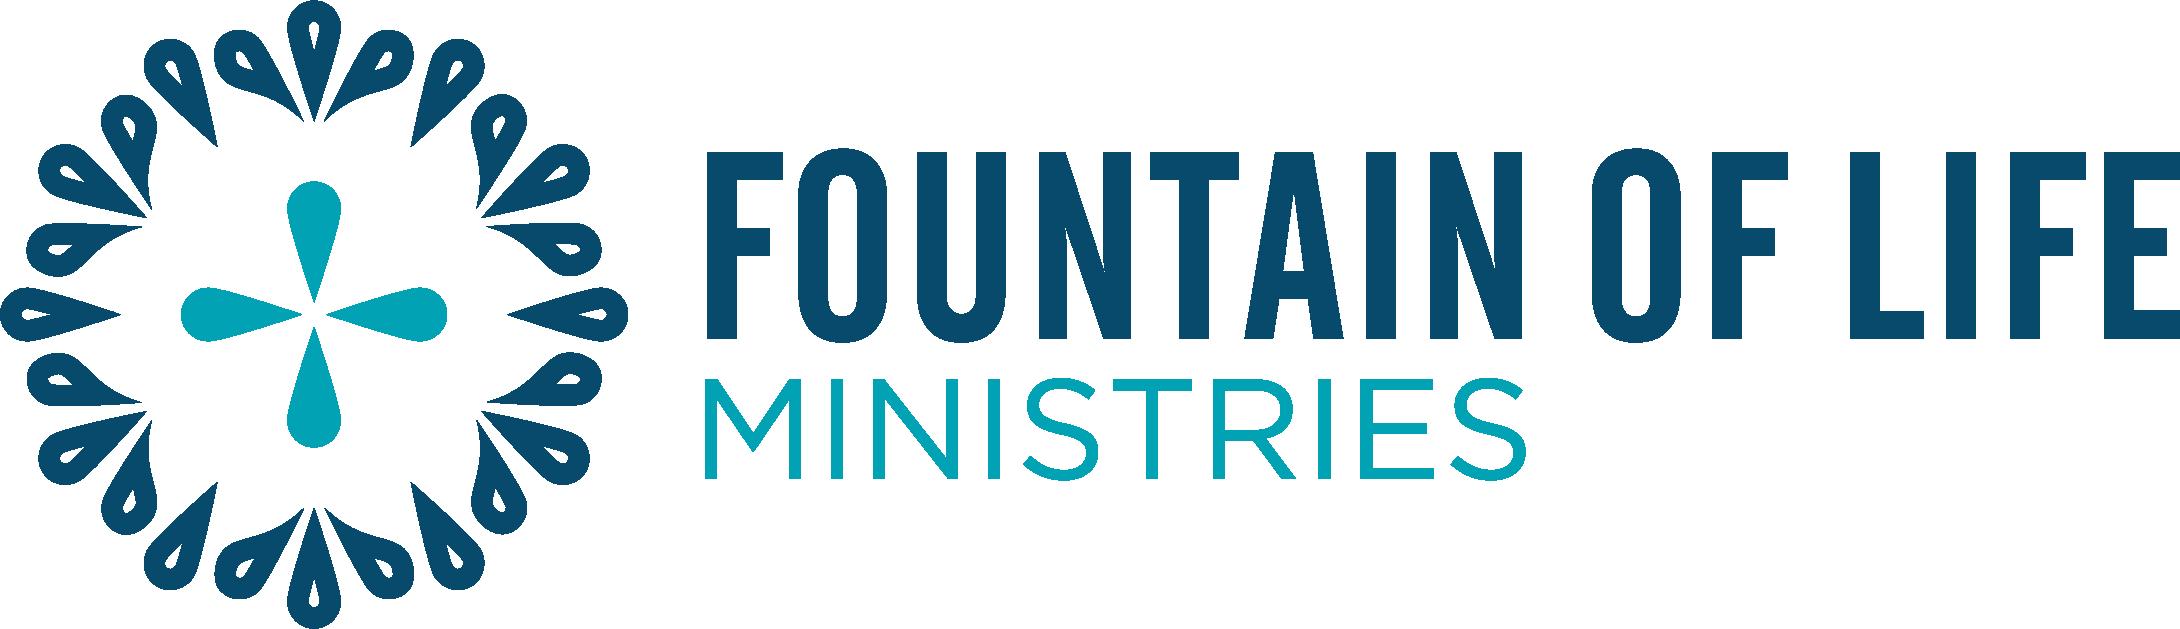 Fountain of Life Ministries Logo RGB Two Tone Blue 300dpi (1).png